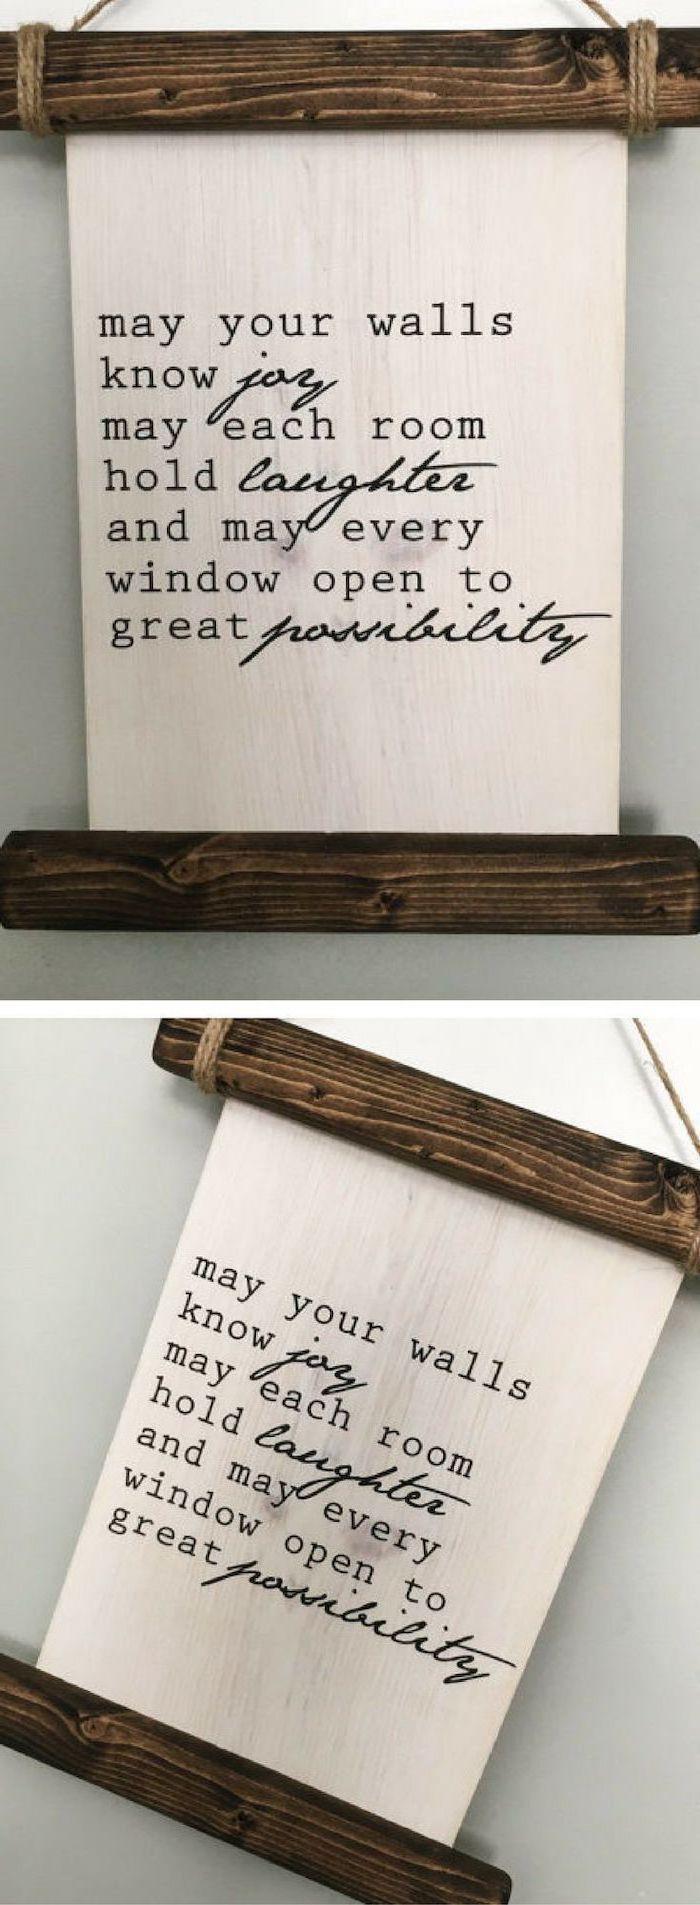 wooden board, good wishes, written on it, personalized housewarming gifts